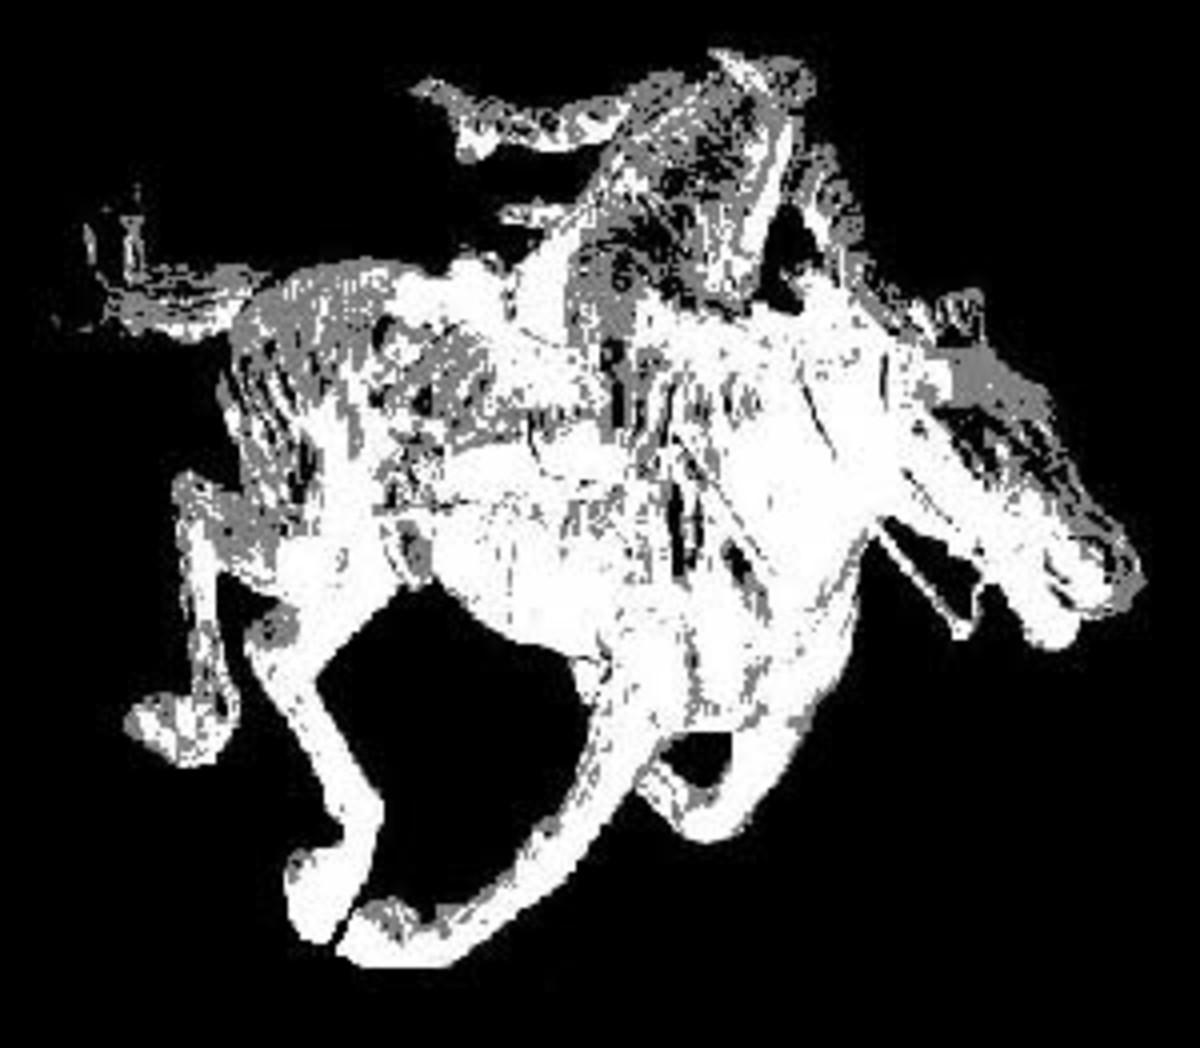 El Muerto rides again!